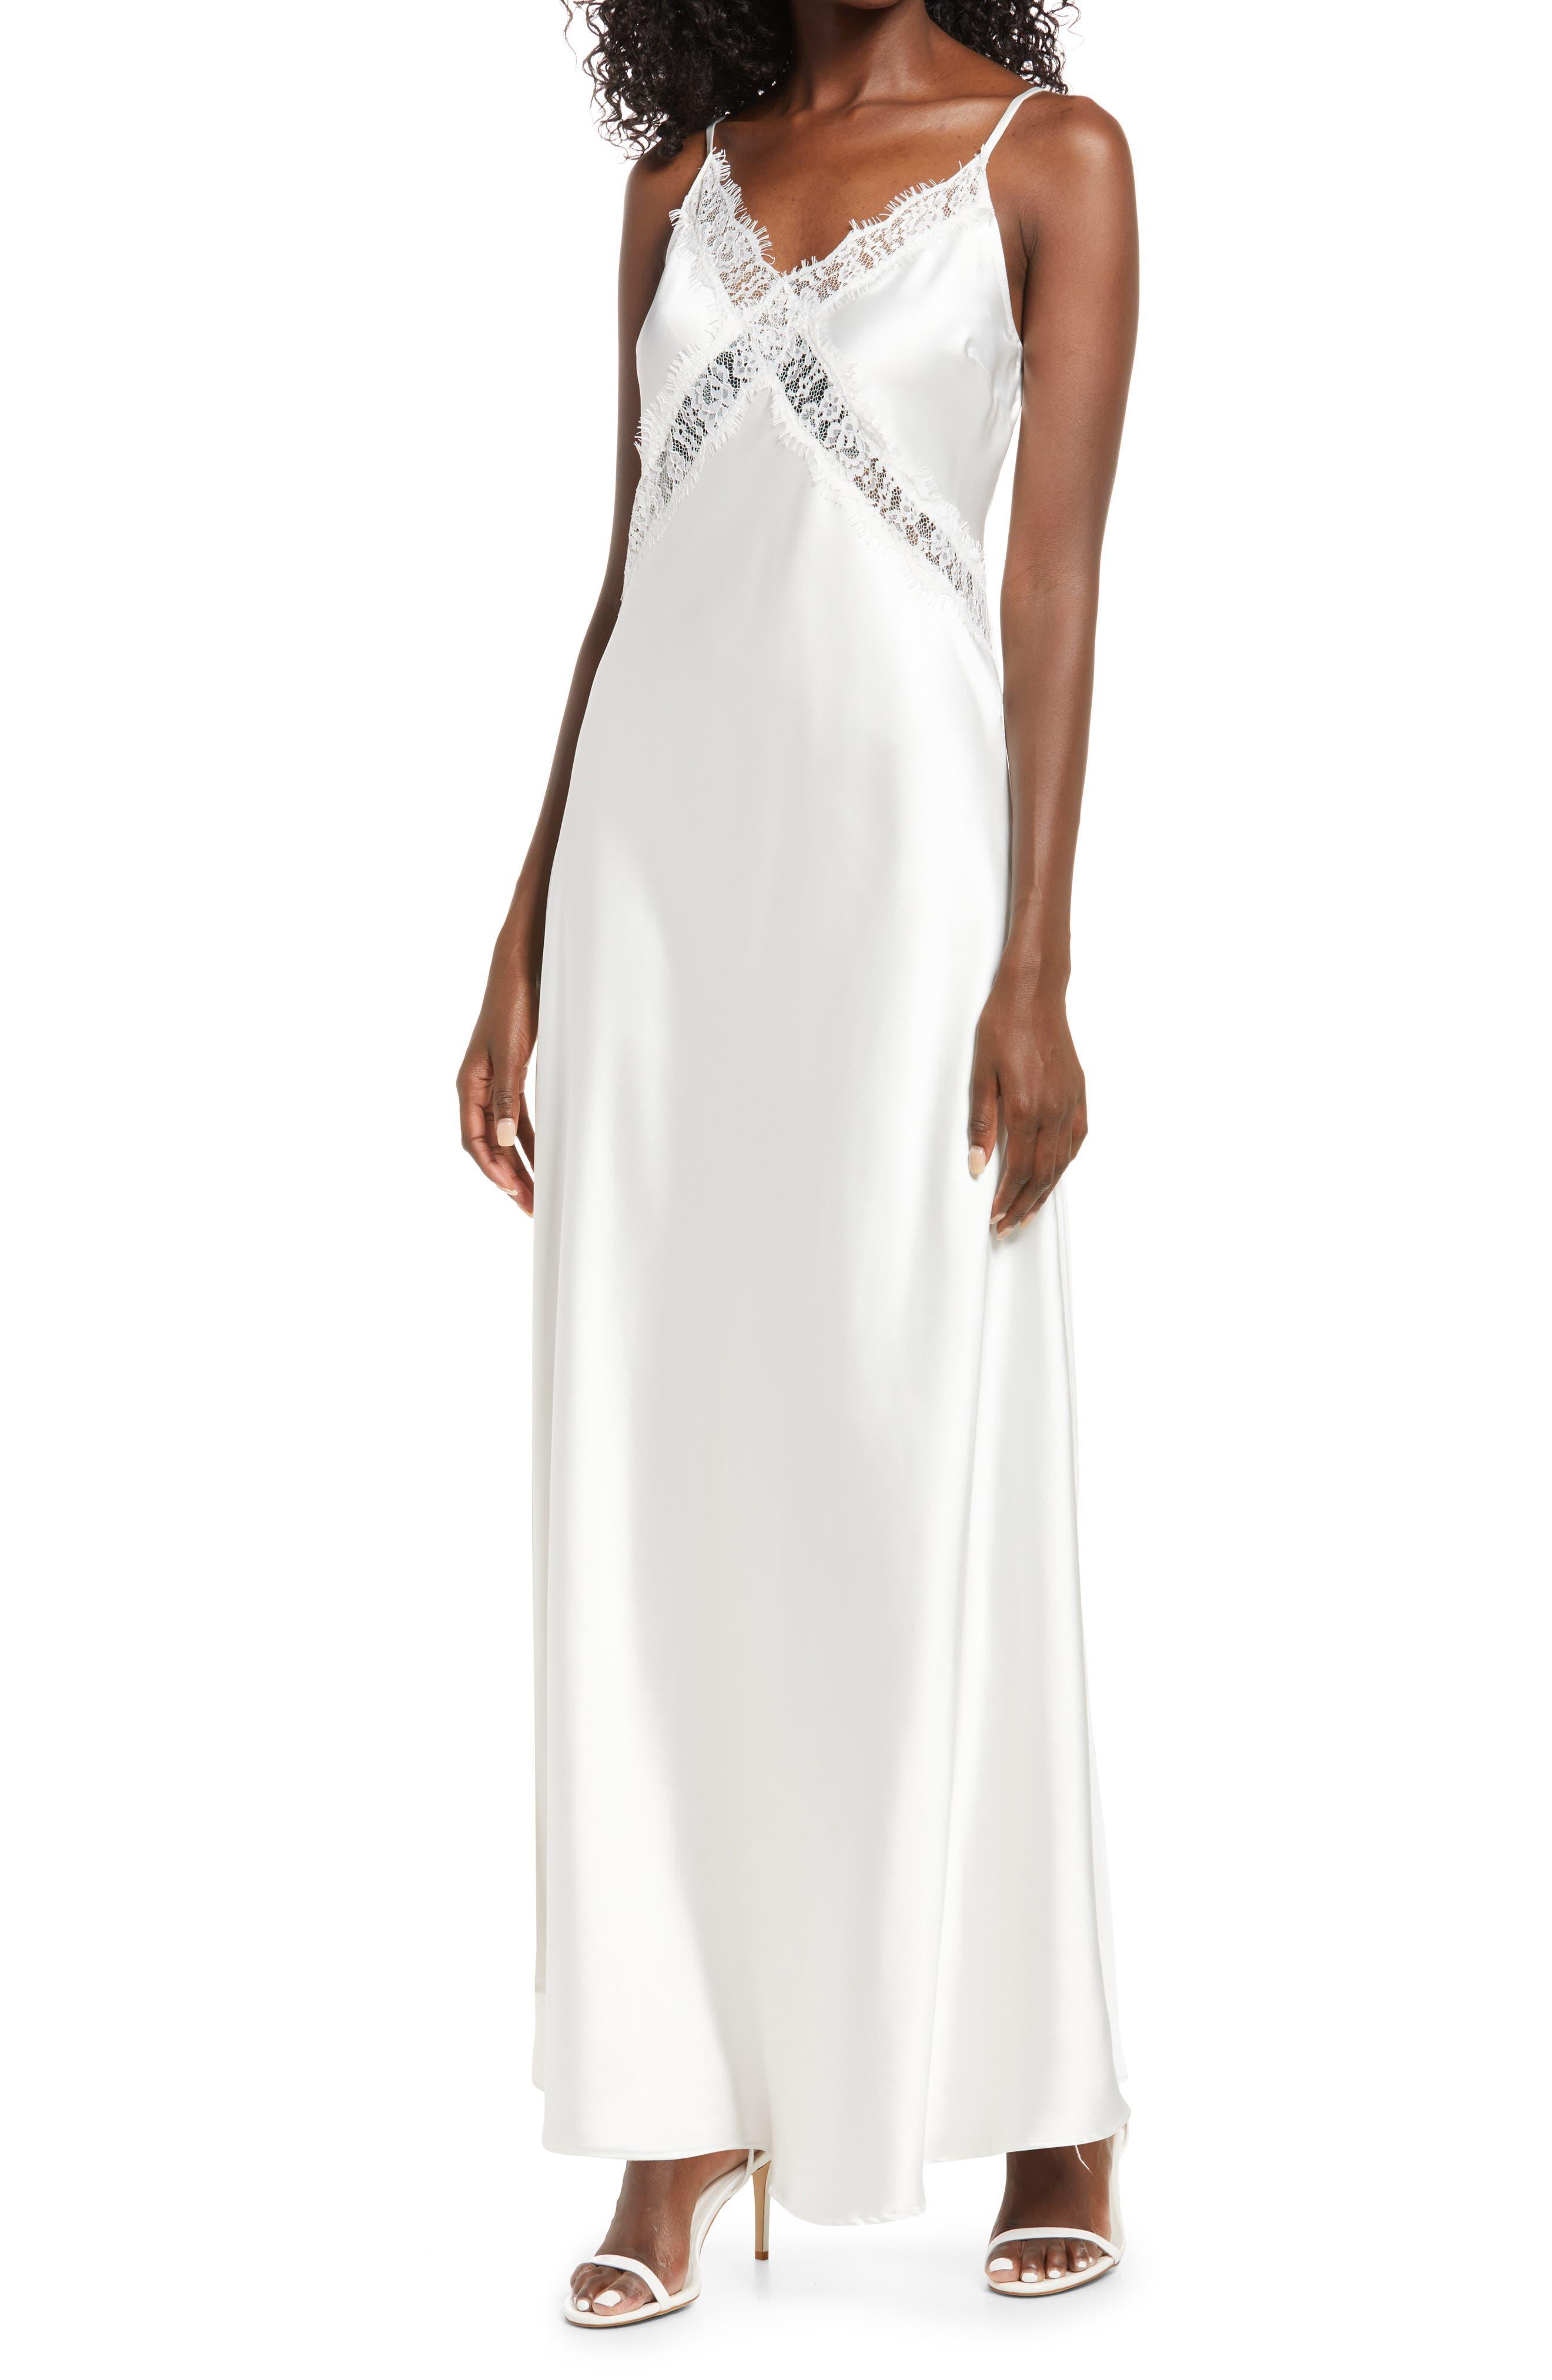 60s Wedding Dresses   70s Wedding Dresses Womens Lulus Love  Romance Satin Evening Gown Size Large - White $78.00 AT vintagedancer.com